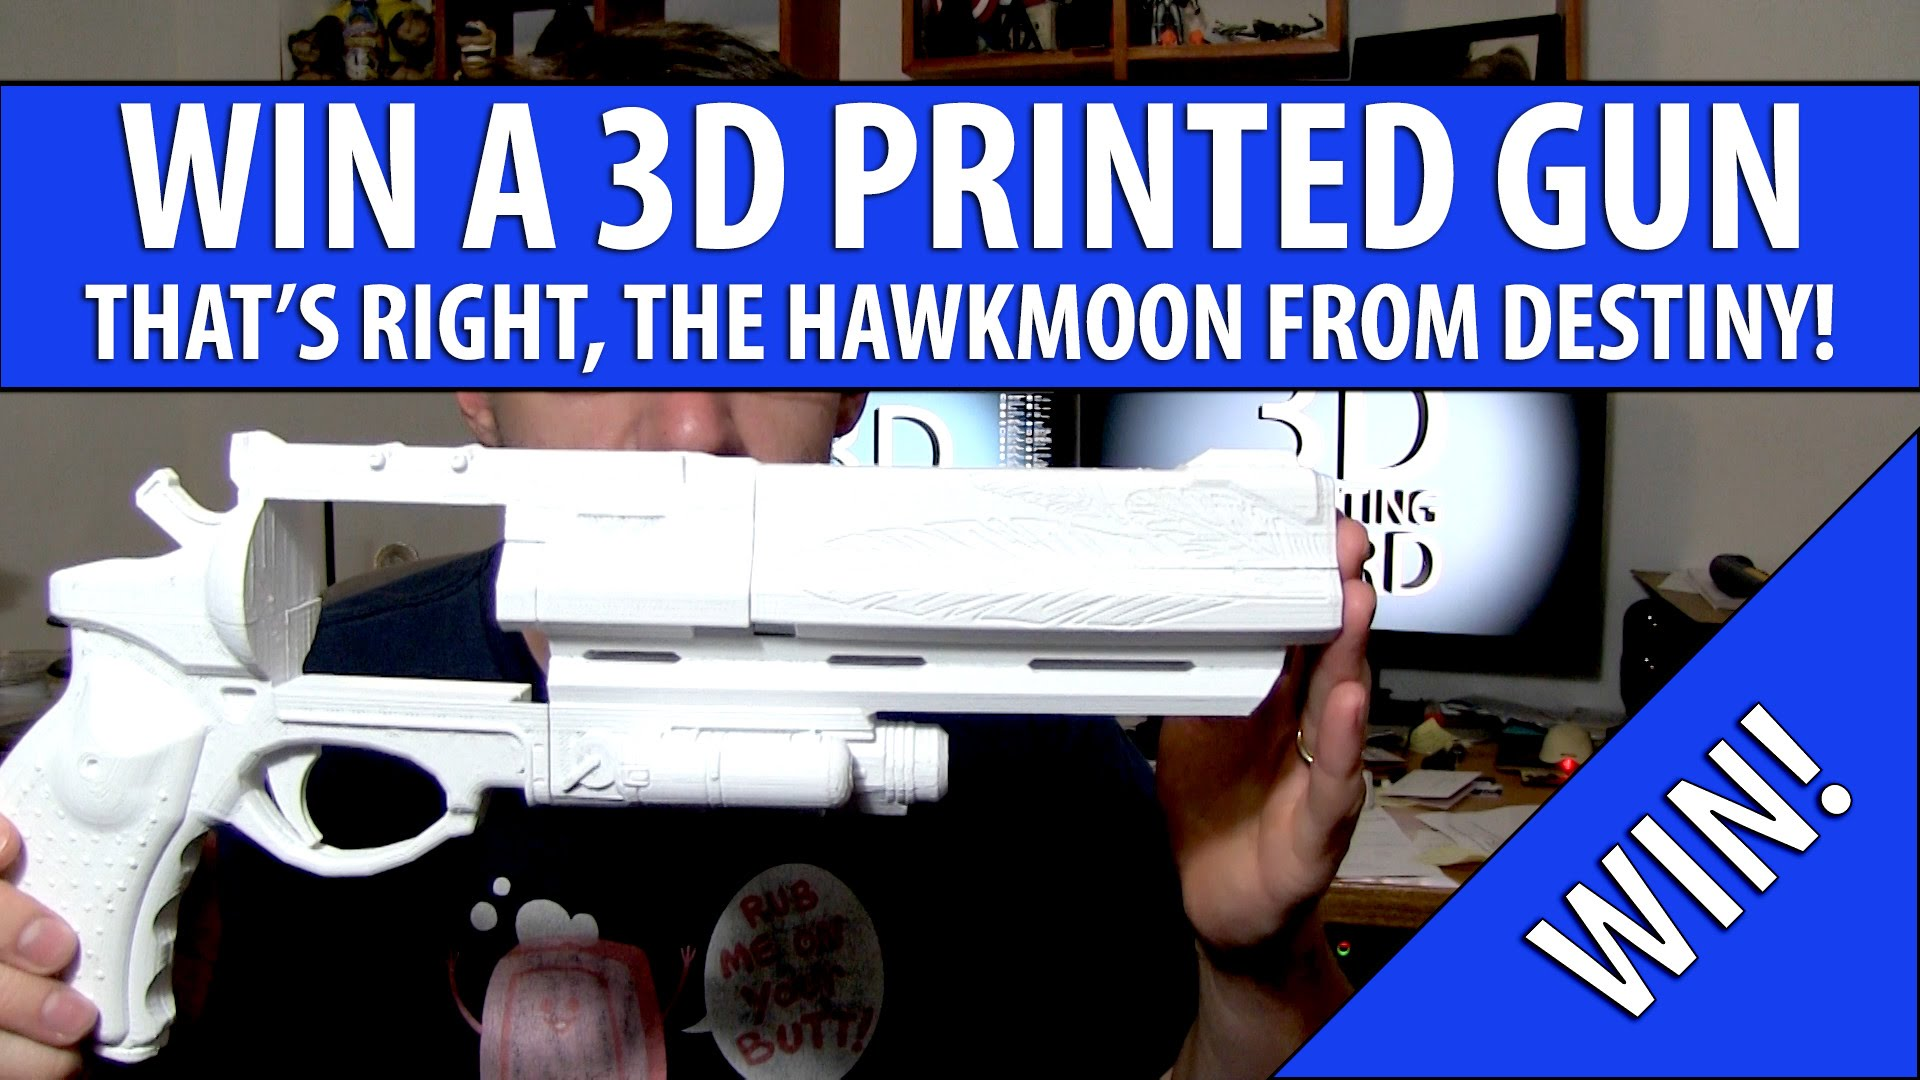 Win a Free 3D Printed Gun (Hawkmoon)